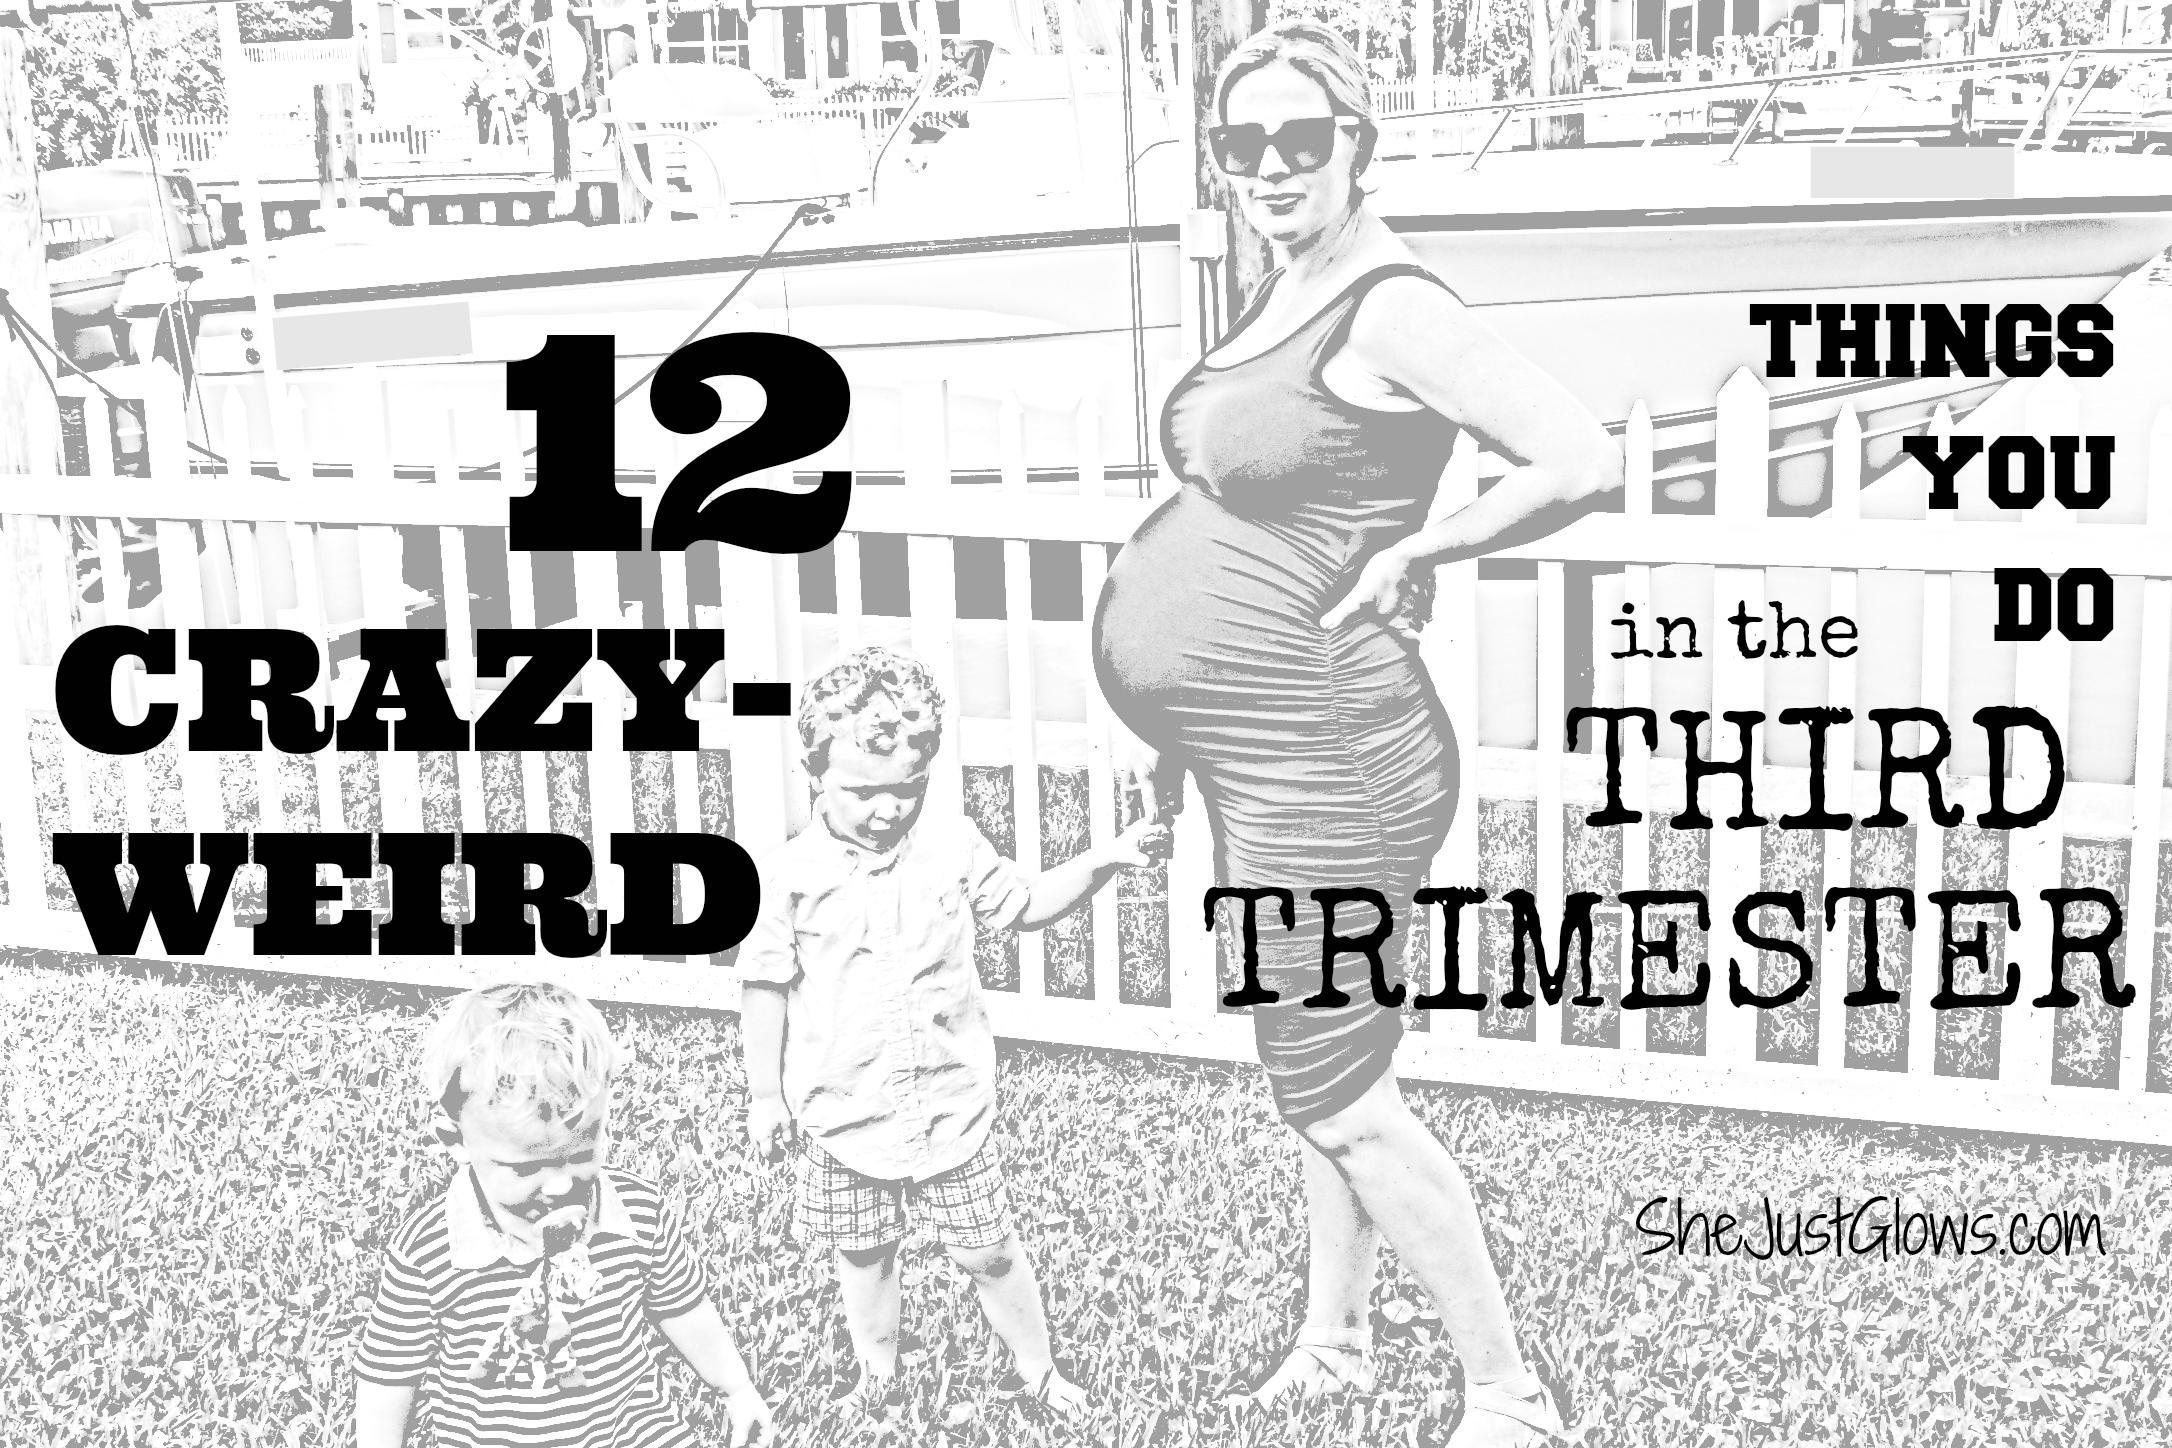 12 Crazy-Weird Things You Do In Your Third Trimester SheJustGlows.com